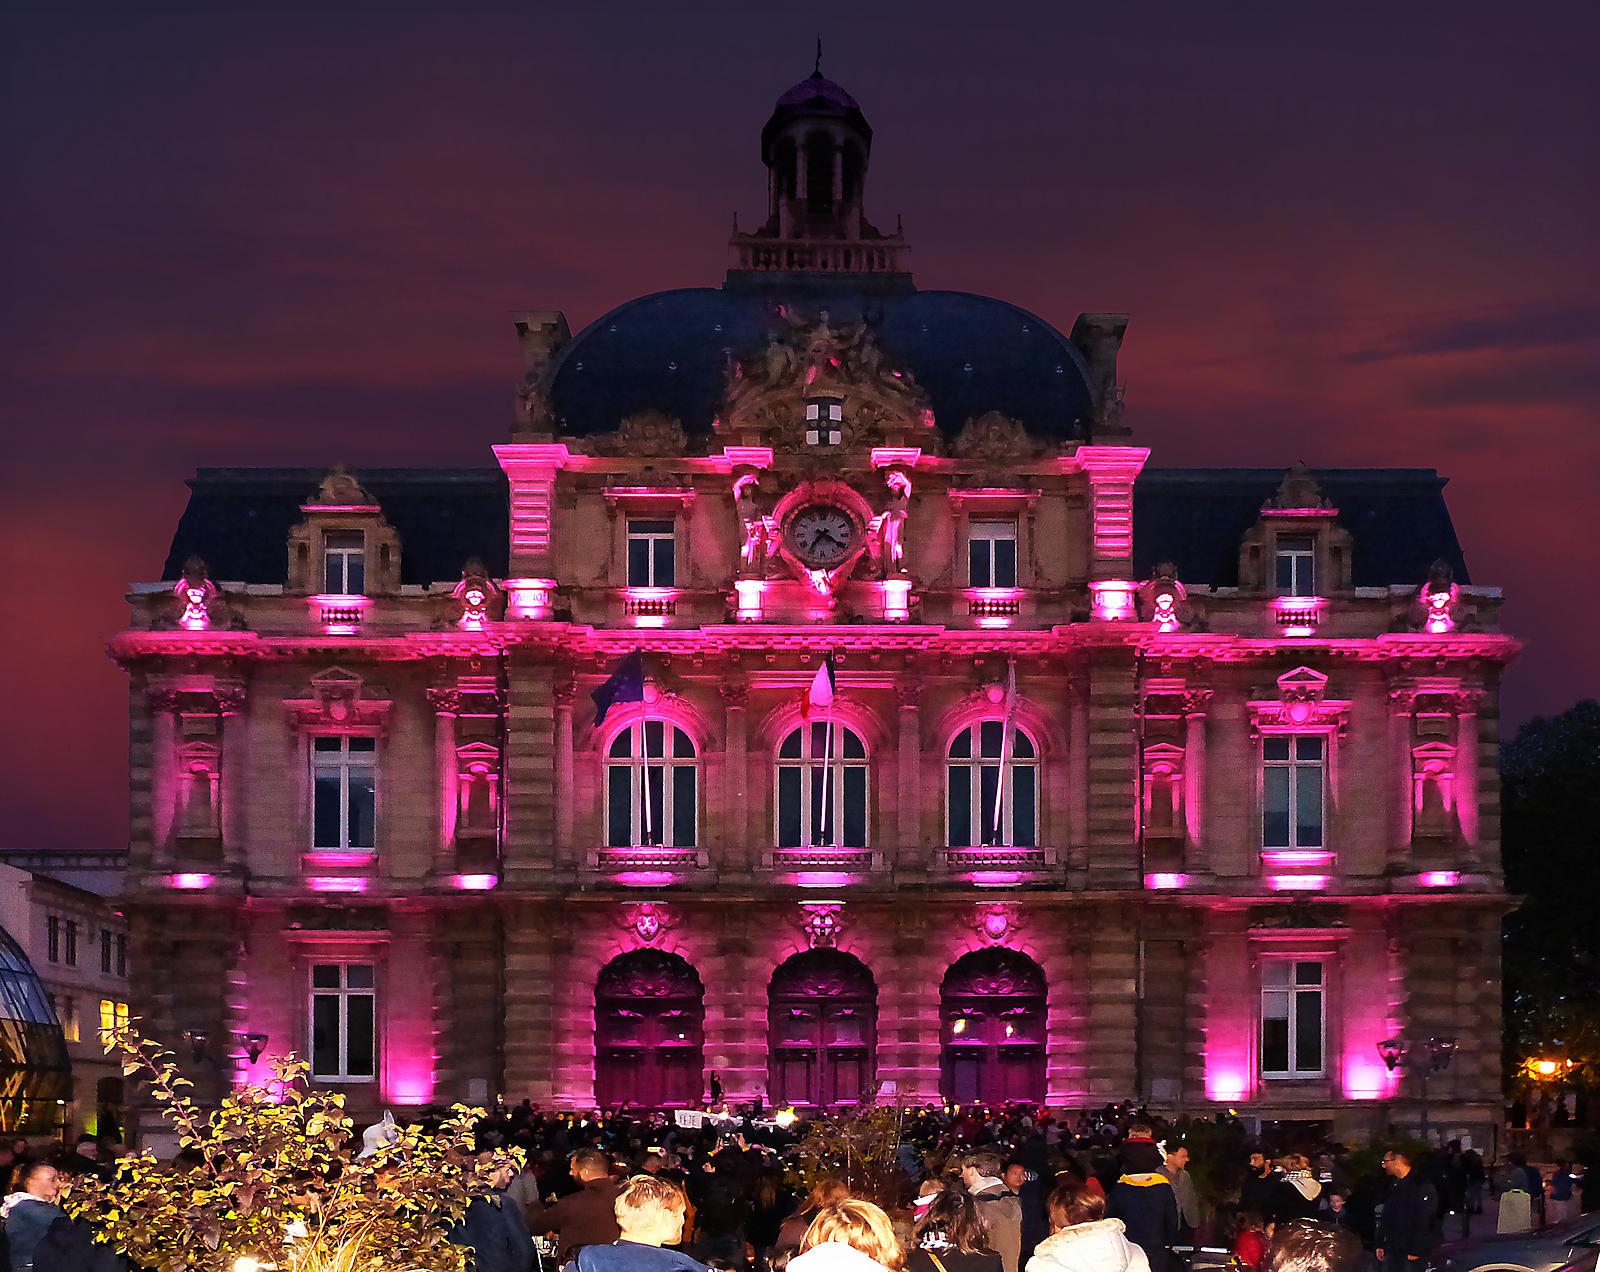 Hôtel de Ville, mairie de Tourcoing - Allumoirs 2019